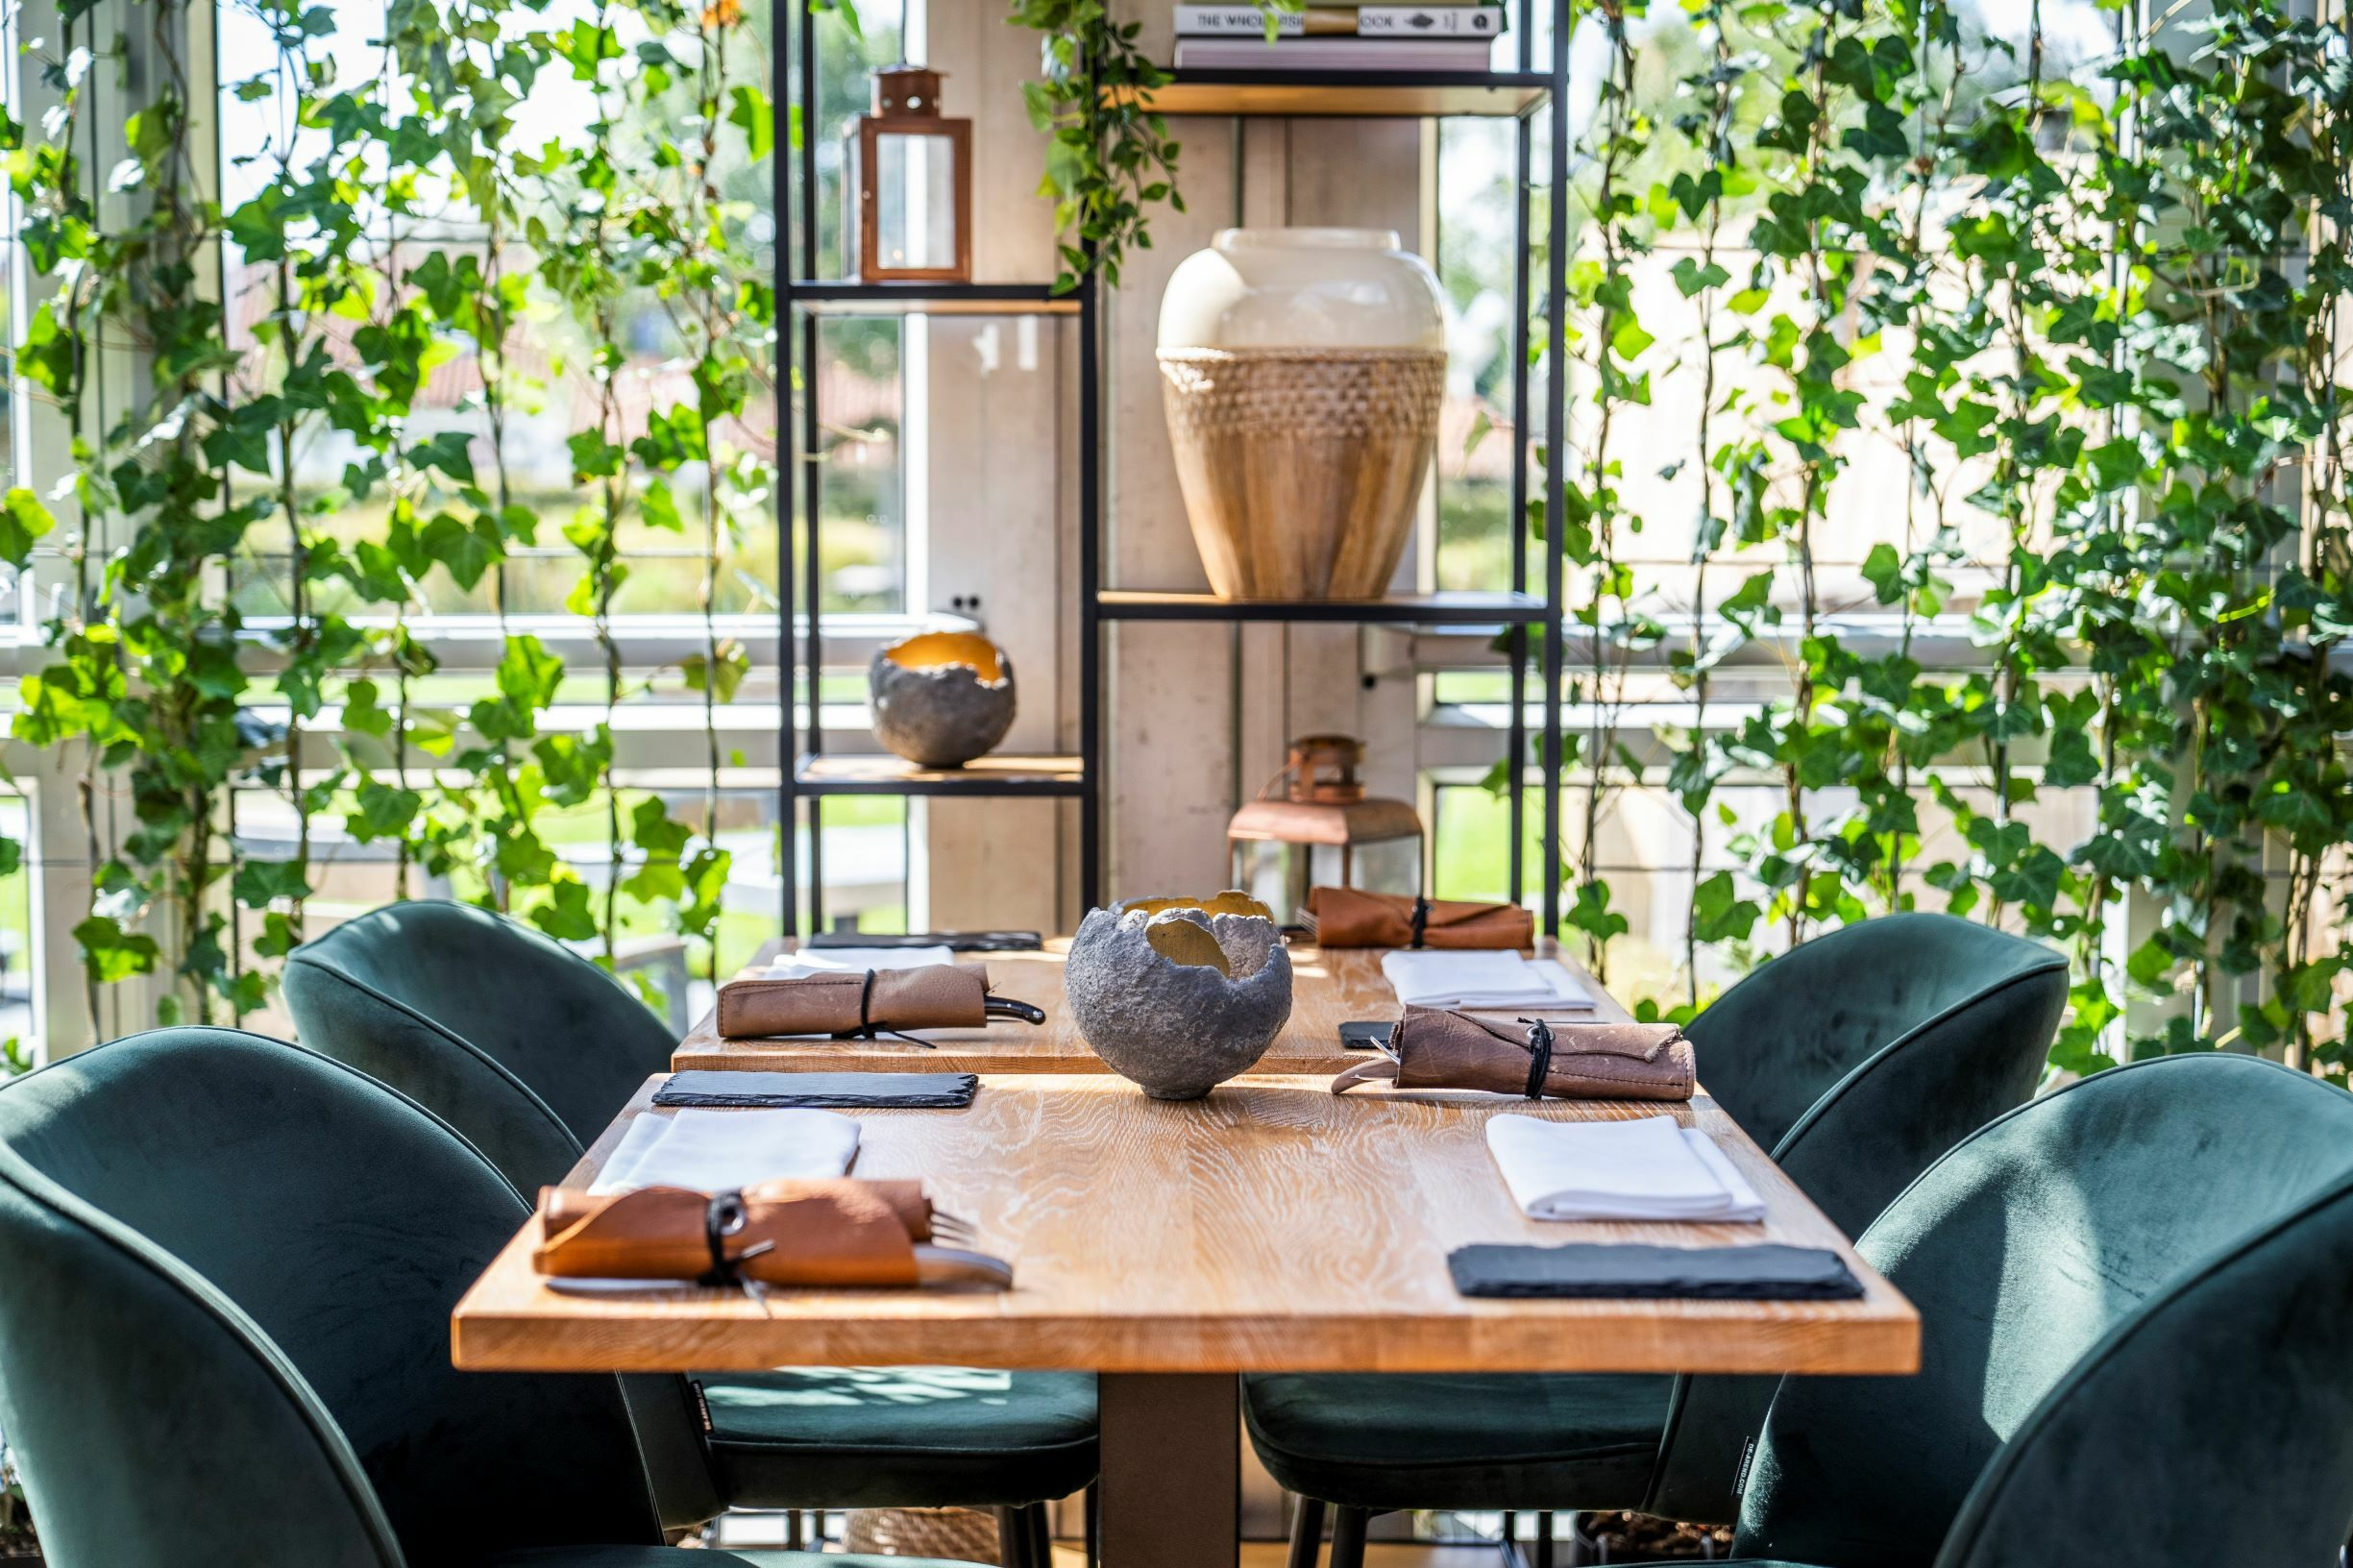 Restaurant Kook Atelier Op Oost fotograaf Liselotte Schoo VVV Texel